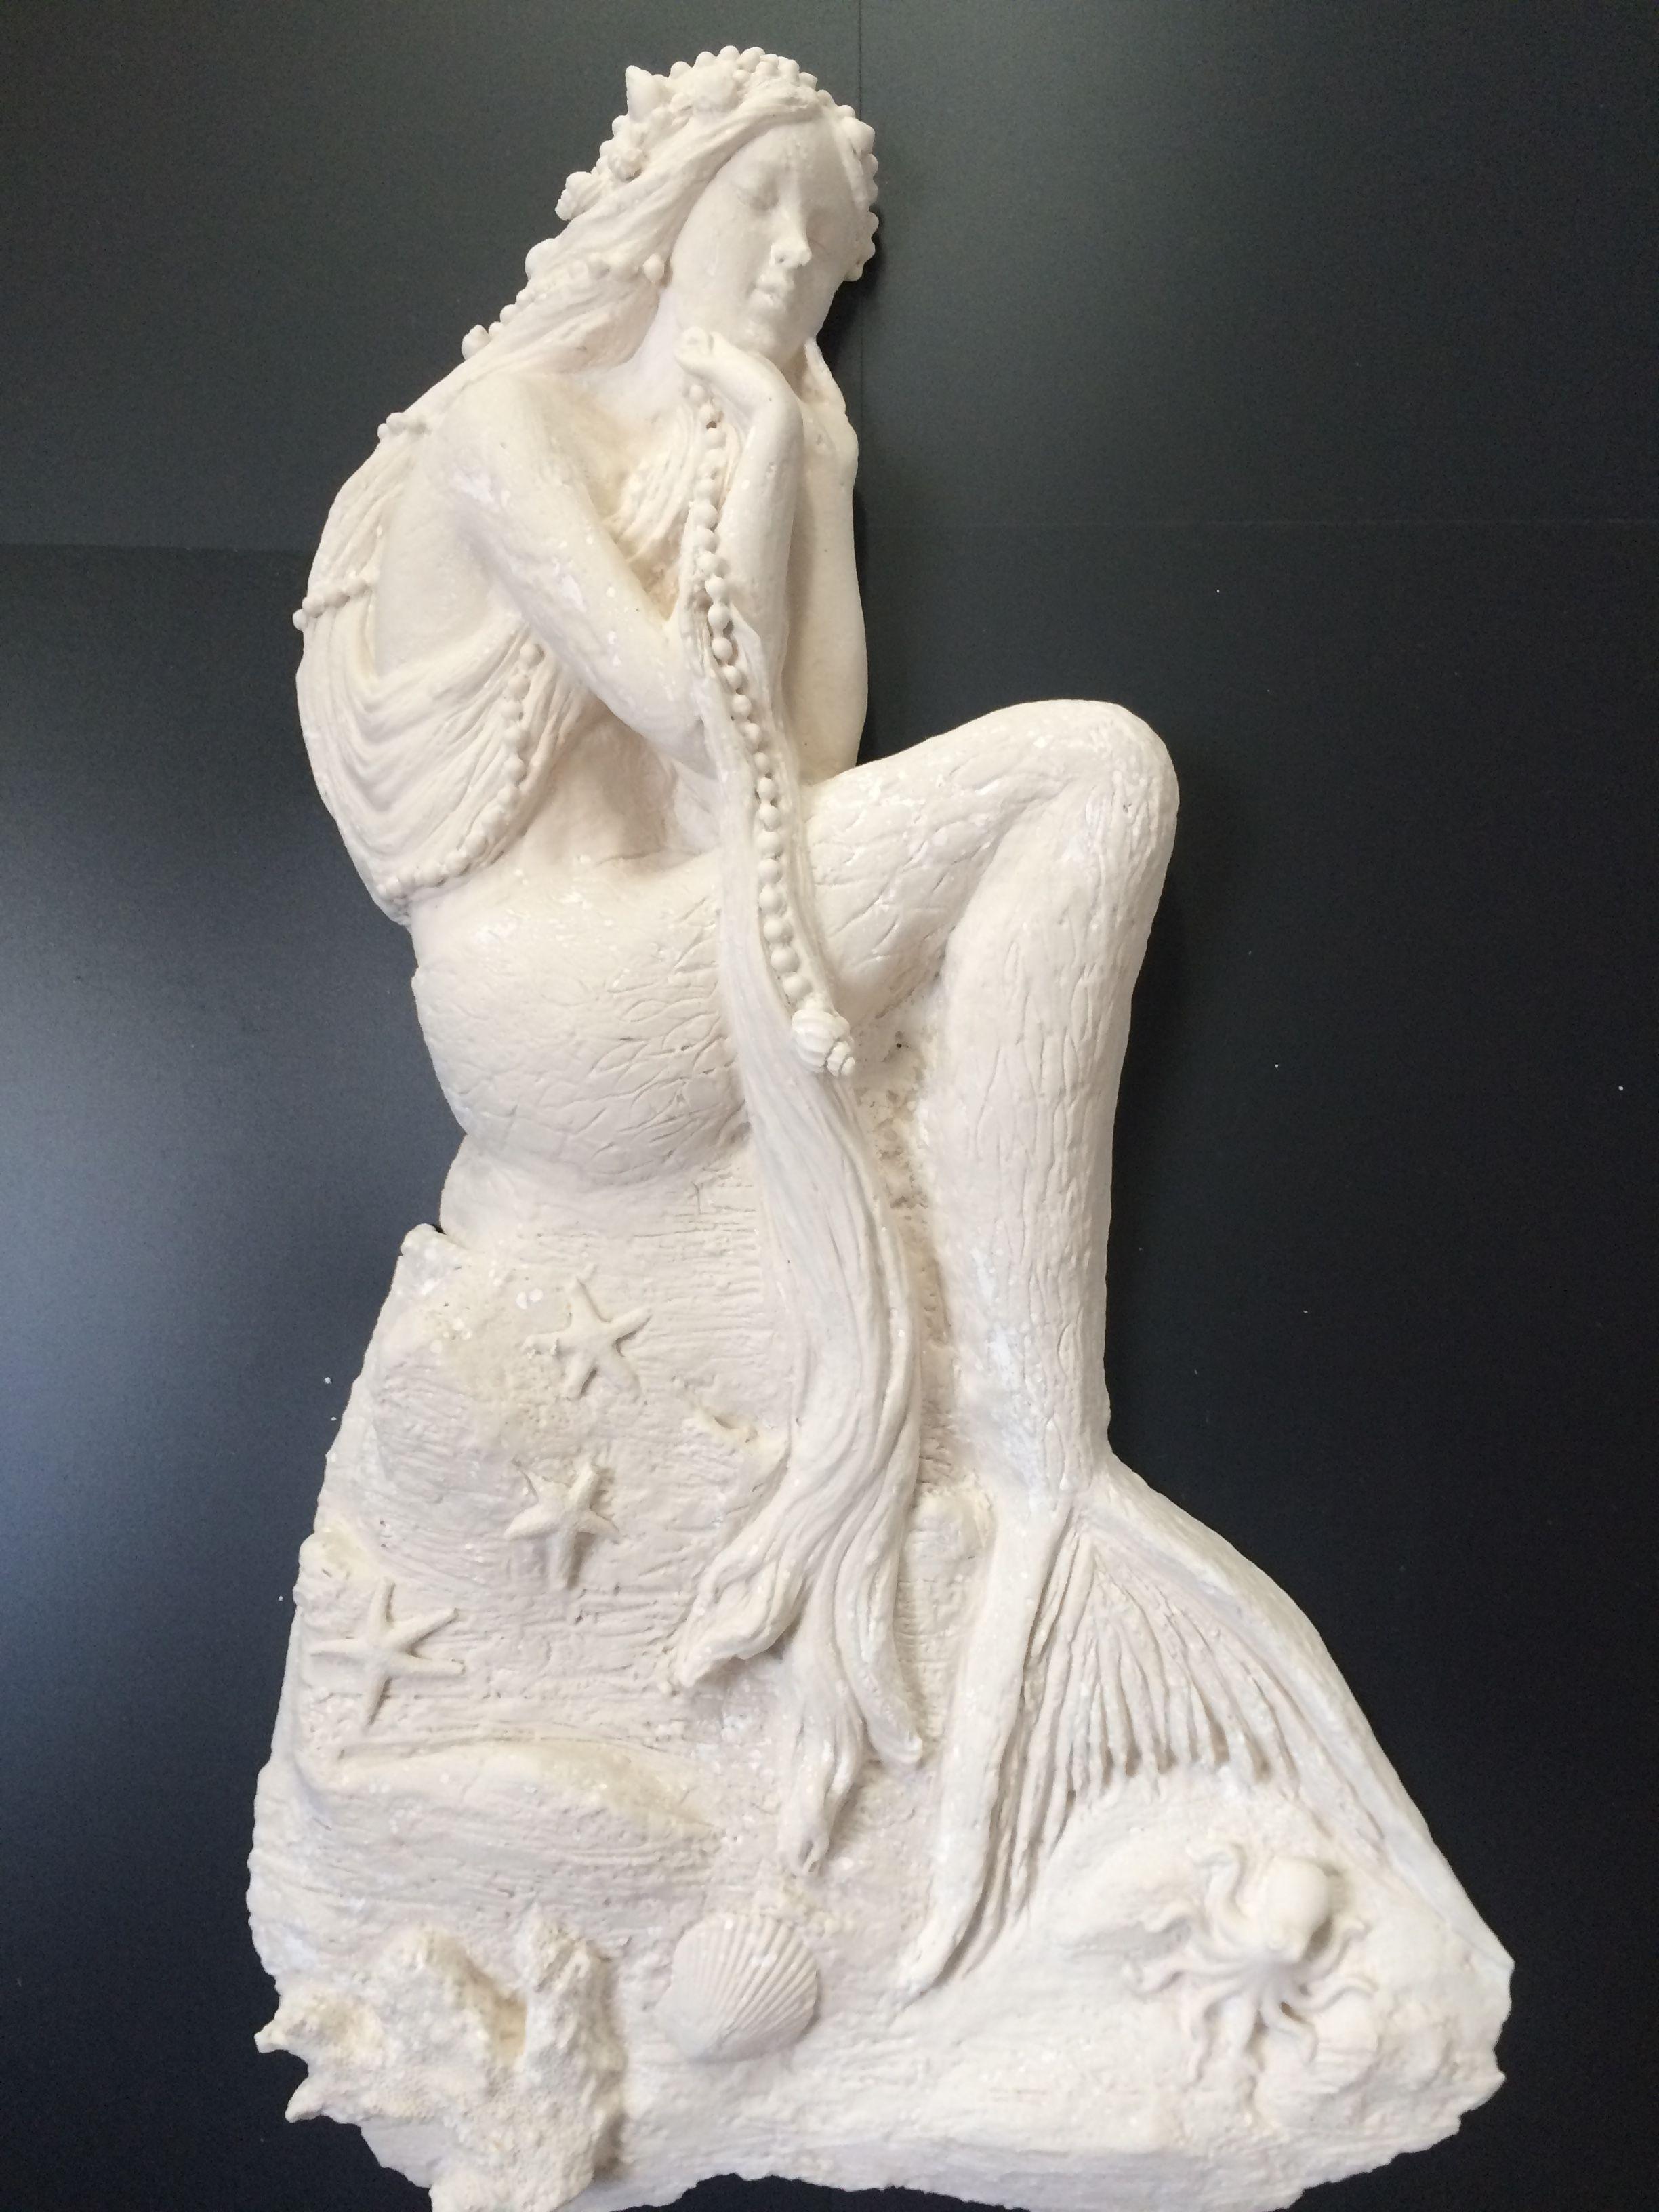 High Relief Sculpturethe Mermaid Sculpted By Ellie Ellis CMS - Artist uses drywall to create extraordinary sculptures